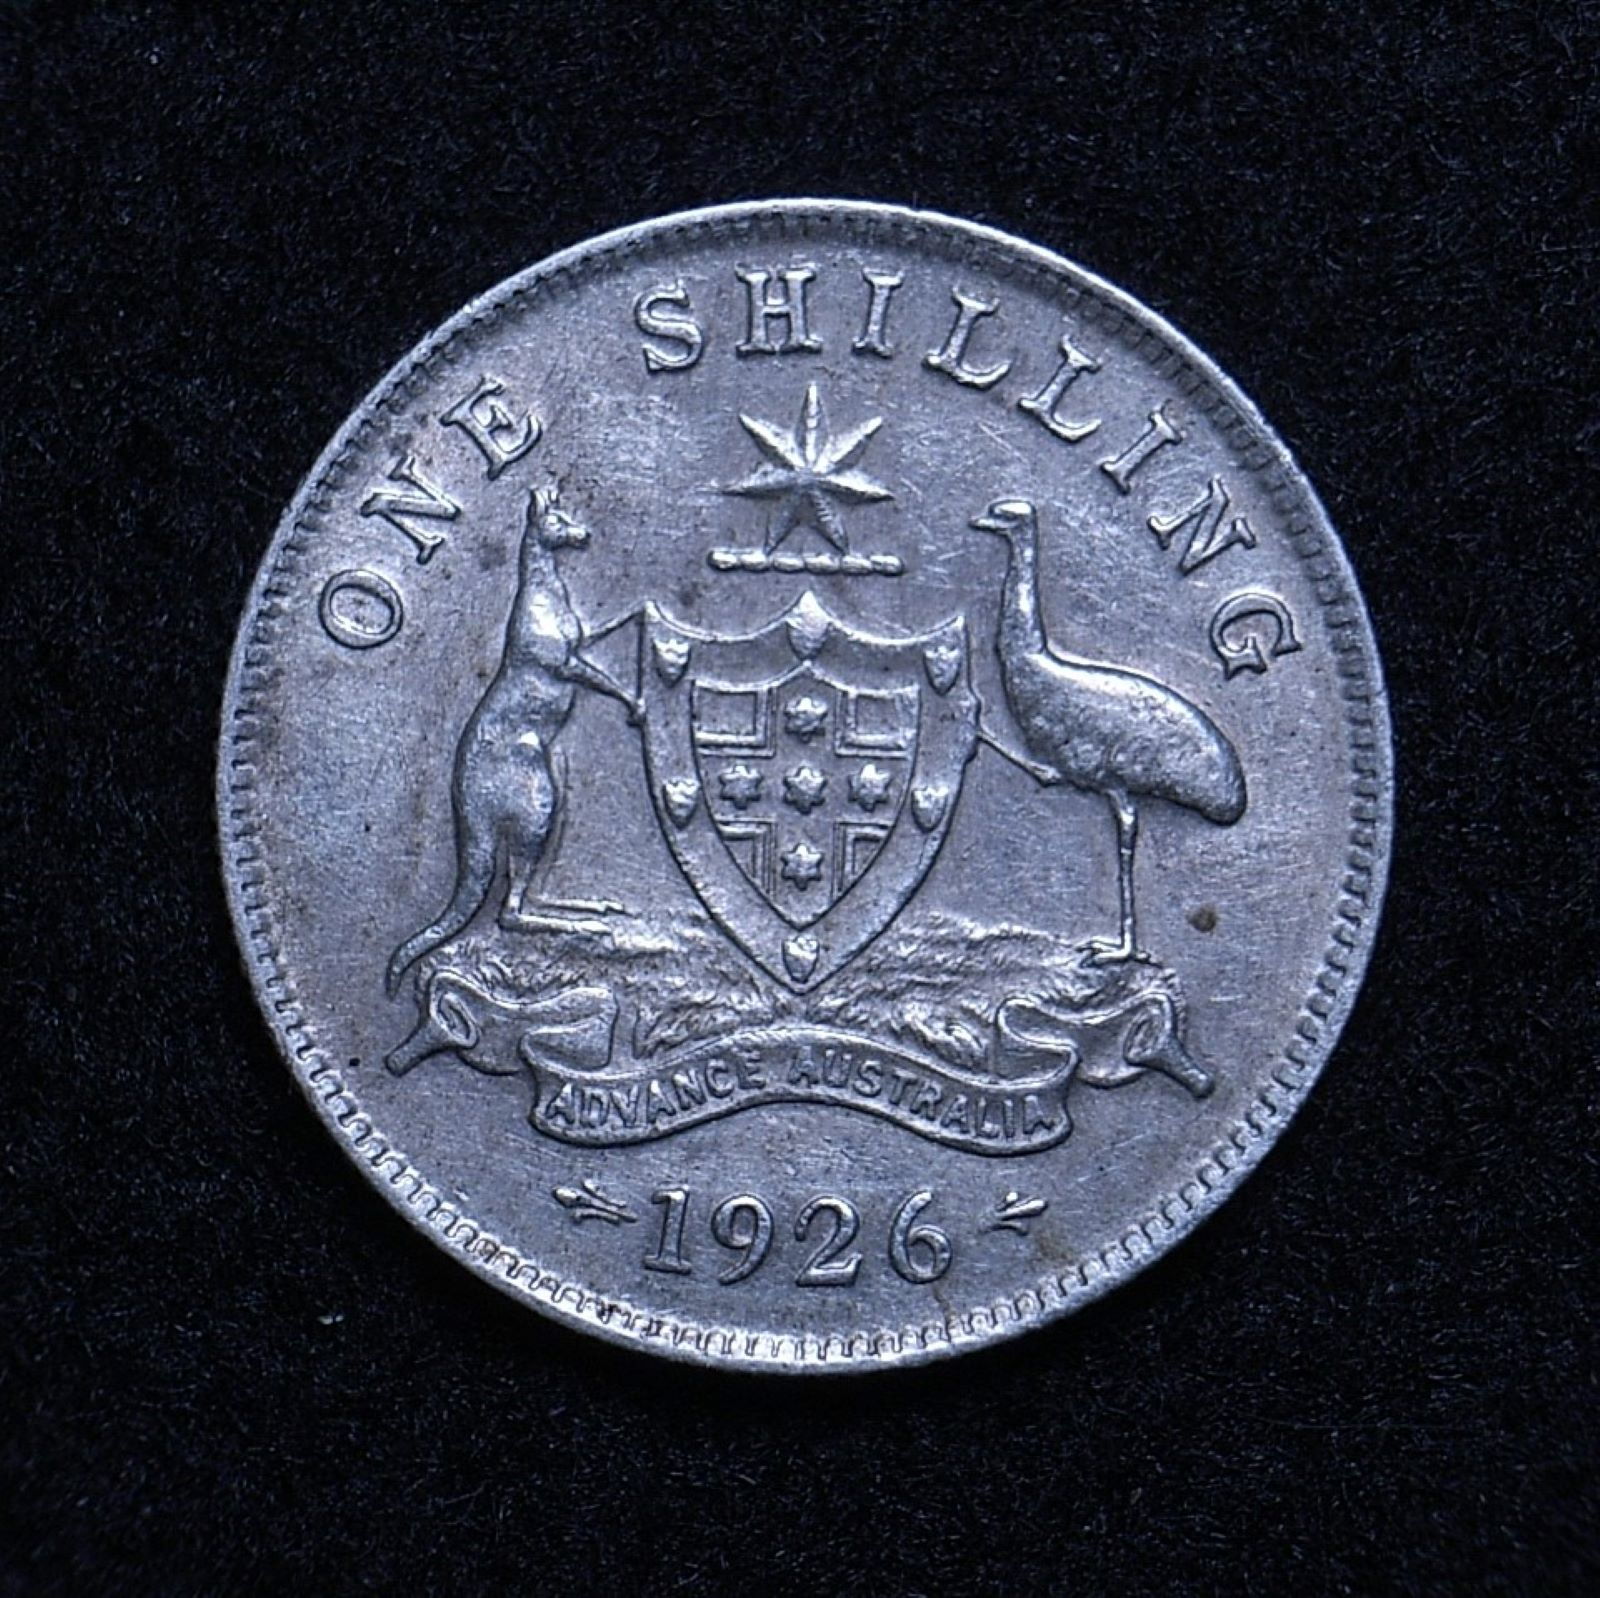 Aus Shilling 1926 rev 1